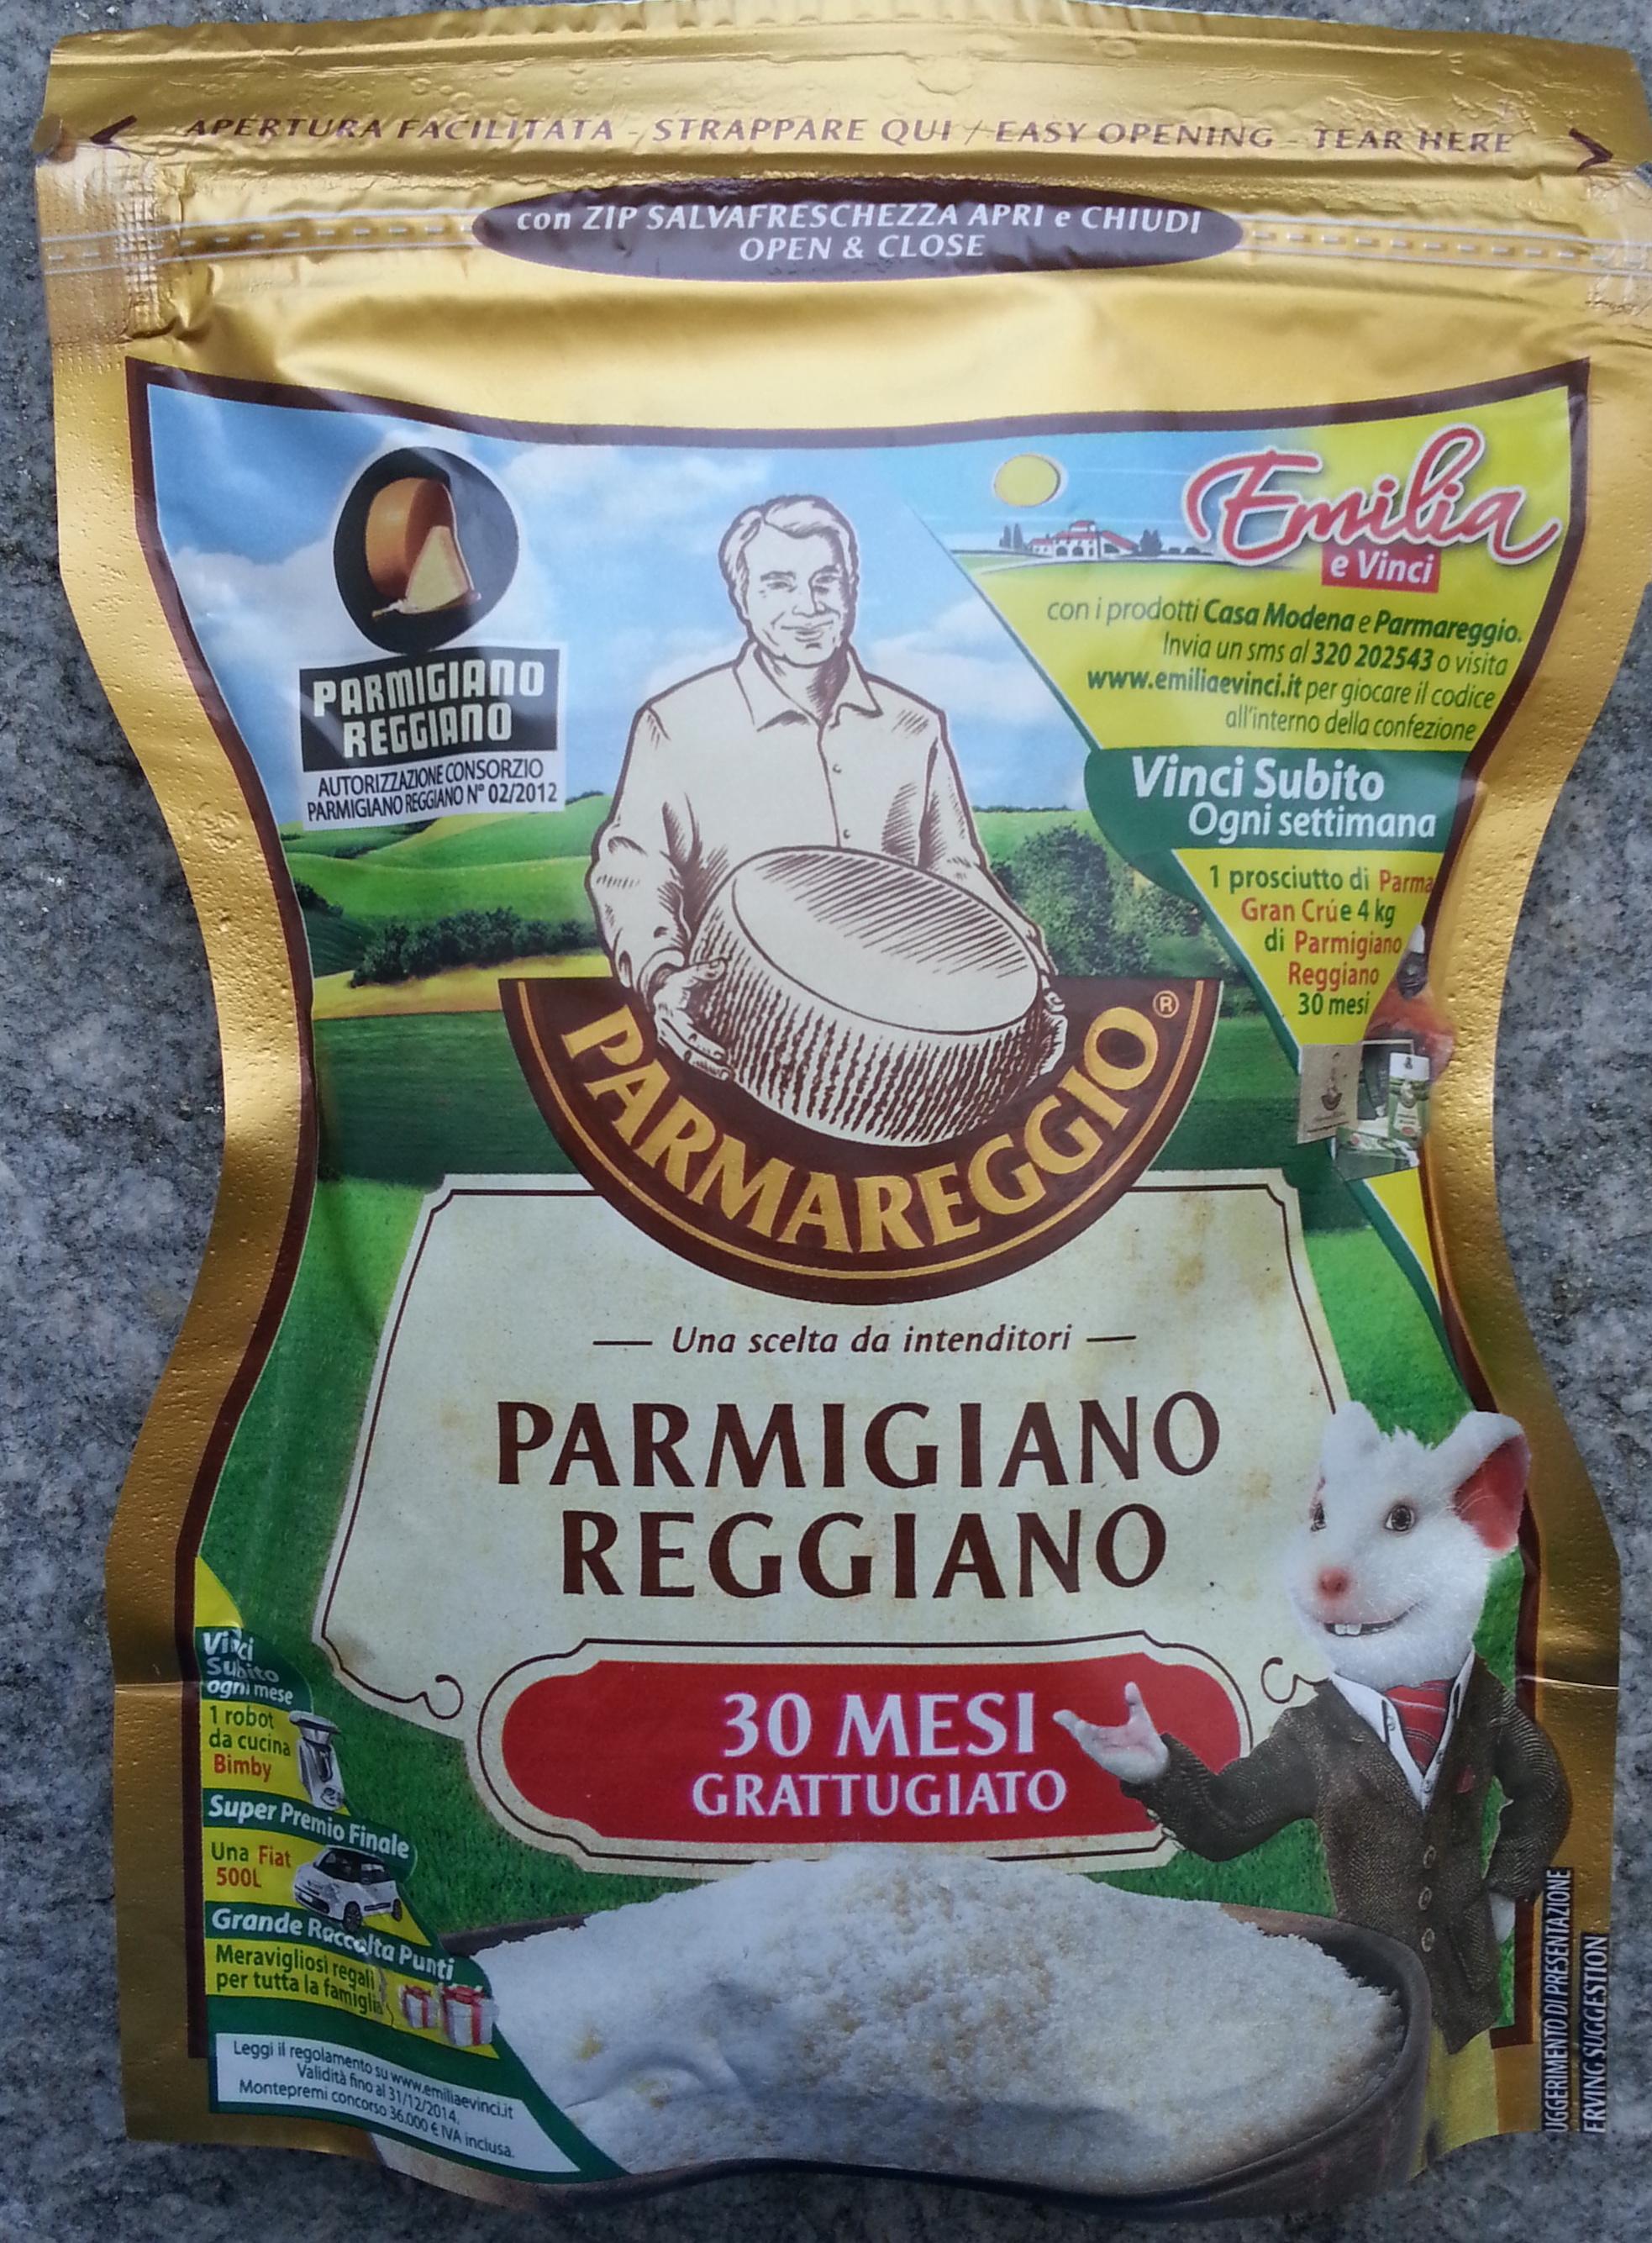 Parmareggio - Parmigiano reggiano DOP 30 mesi grattugiato - Prodotto